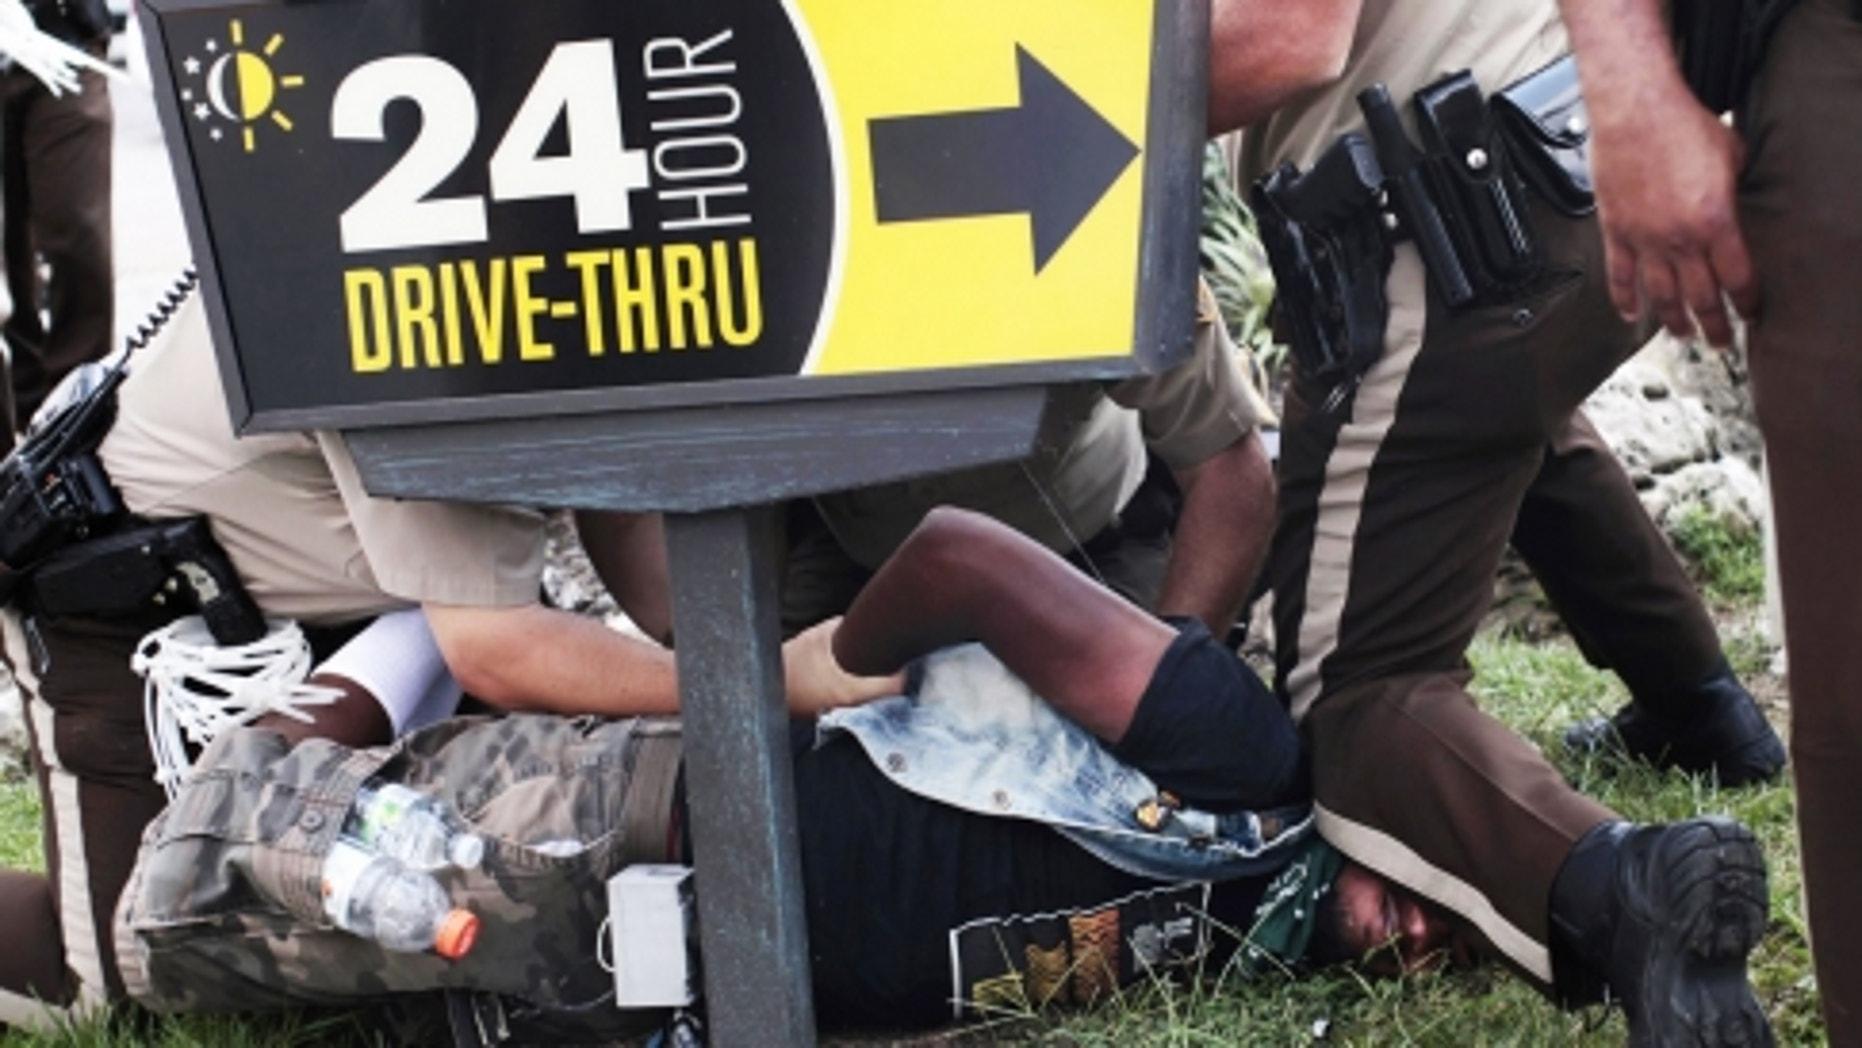 Police officers detain a demonstrator in Ferguson, Mo.